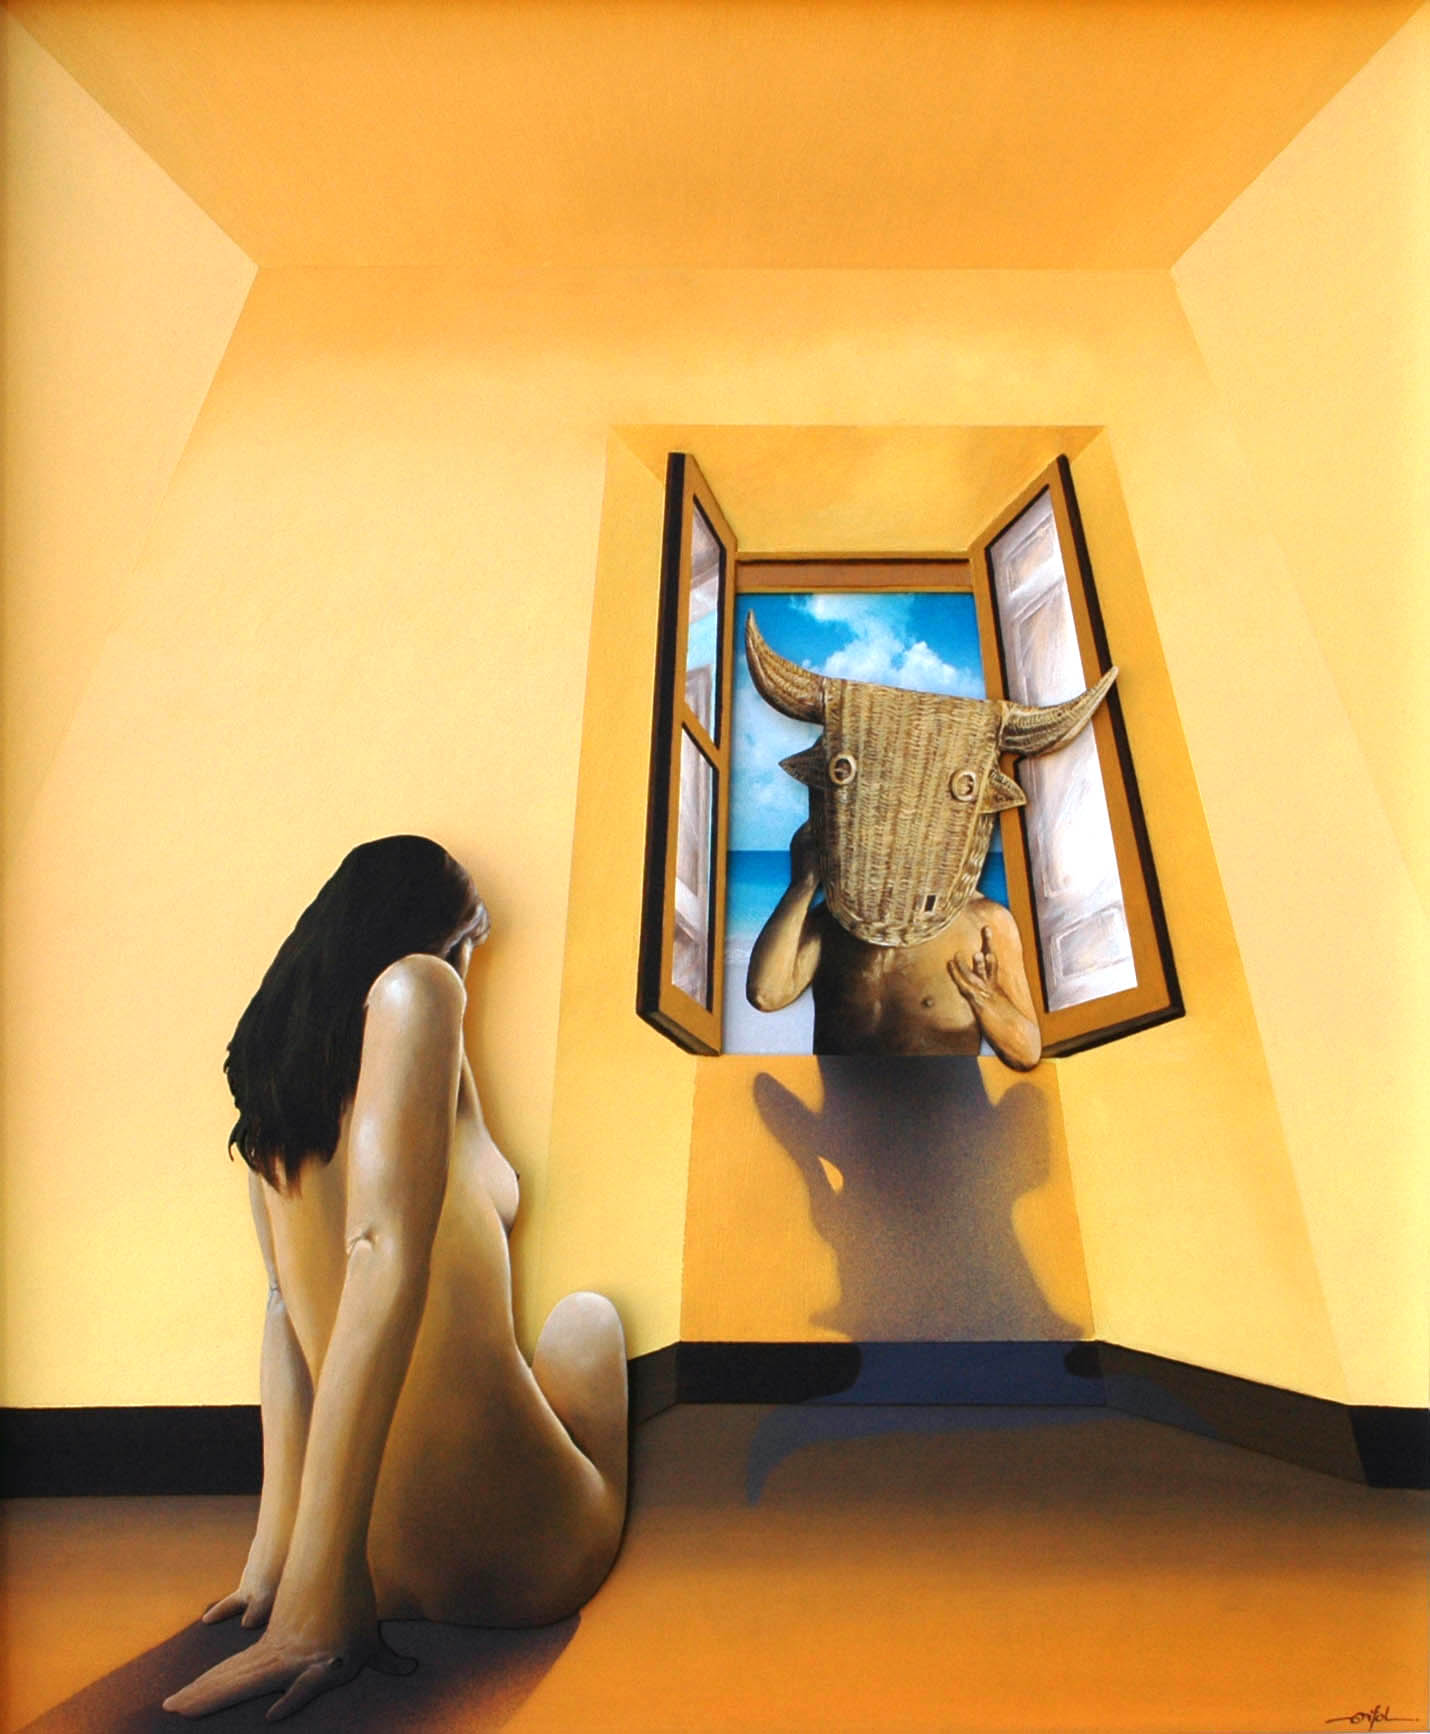 La Visita (2015) - Pedro Grifol Loscos